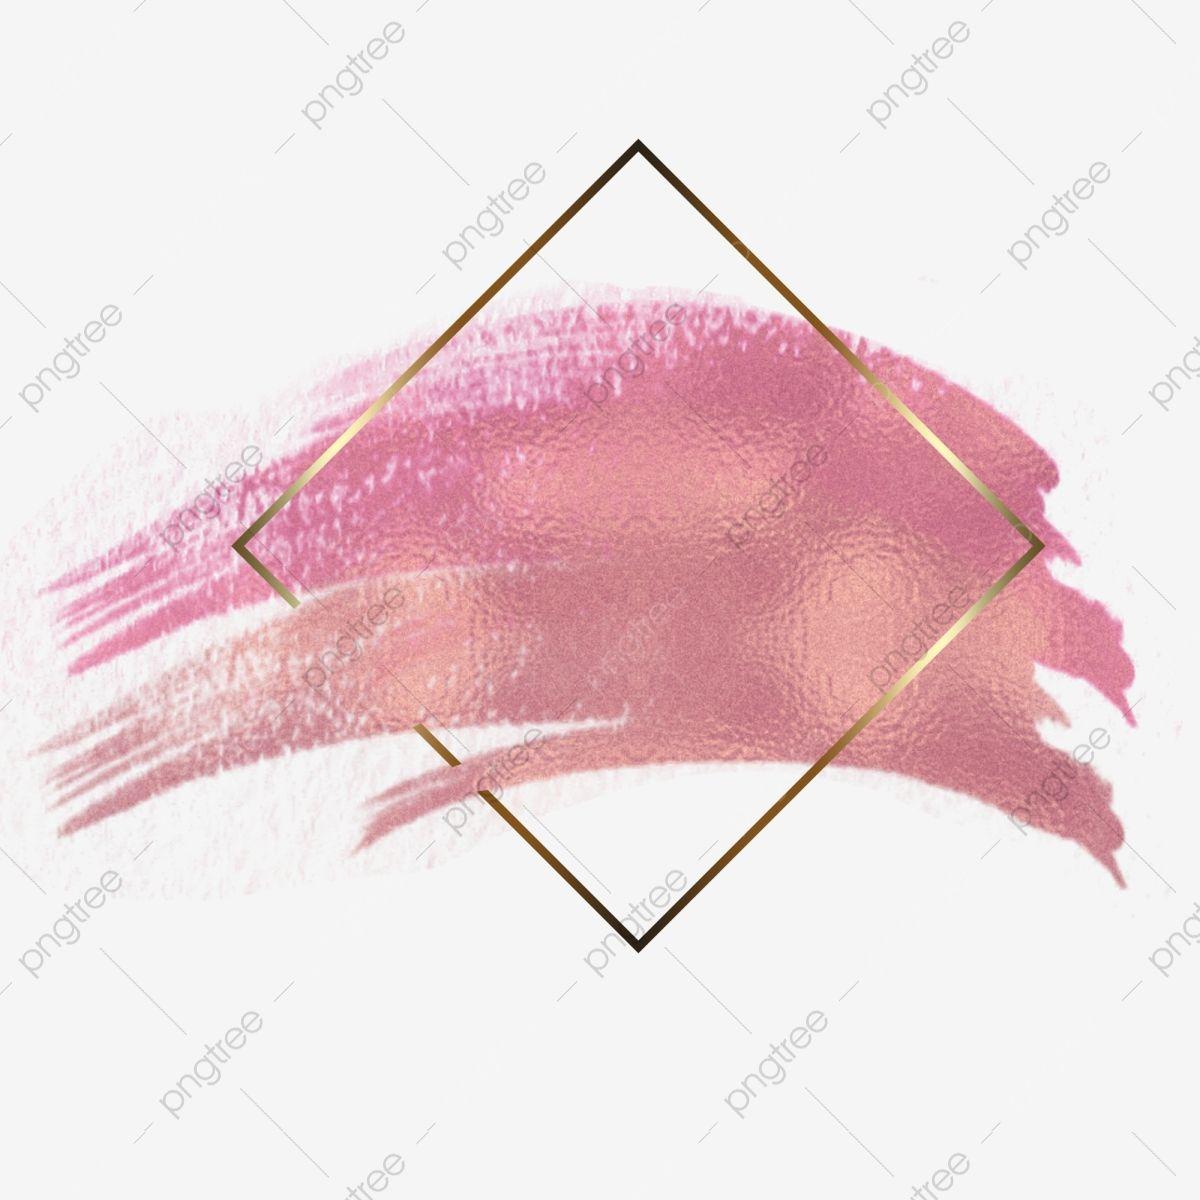 Creative Rose Gold Frame Png Con Fondo Transparente Oro Marco Resumen Png Y Psd Para Descargar Gratis Pngtree Rose Gold Frame Rose Gold Texture 2048x1152 Wallpapers